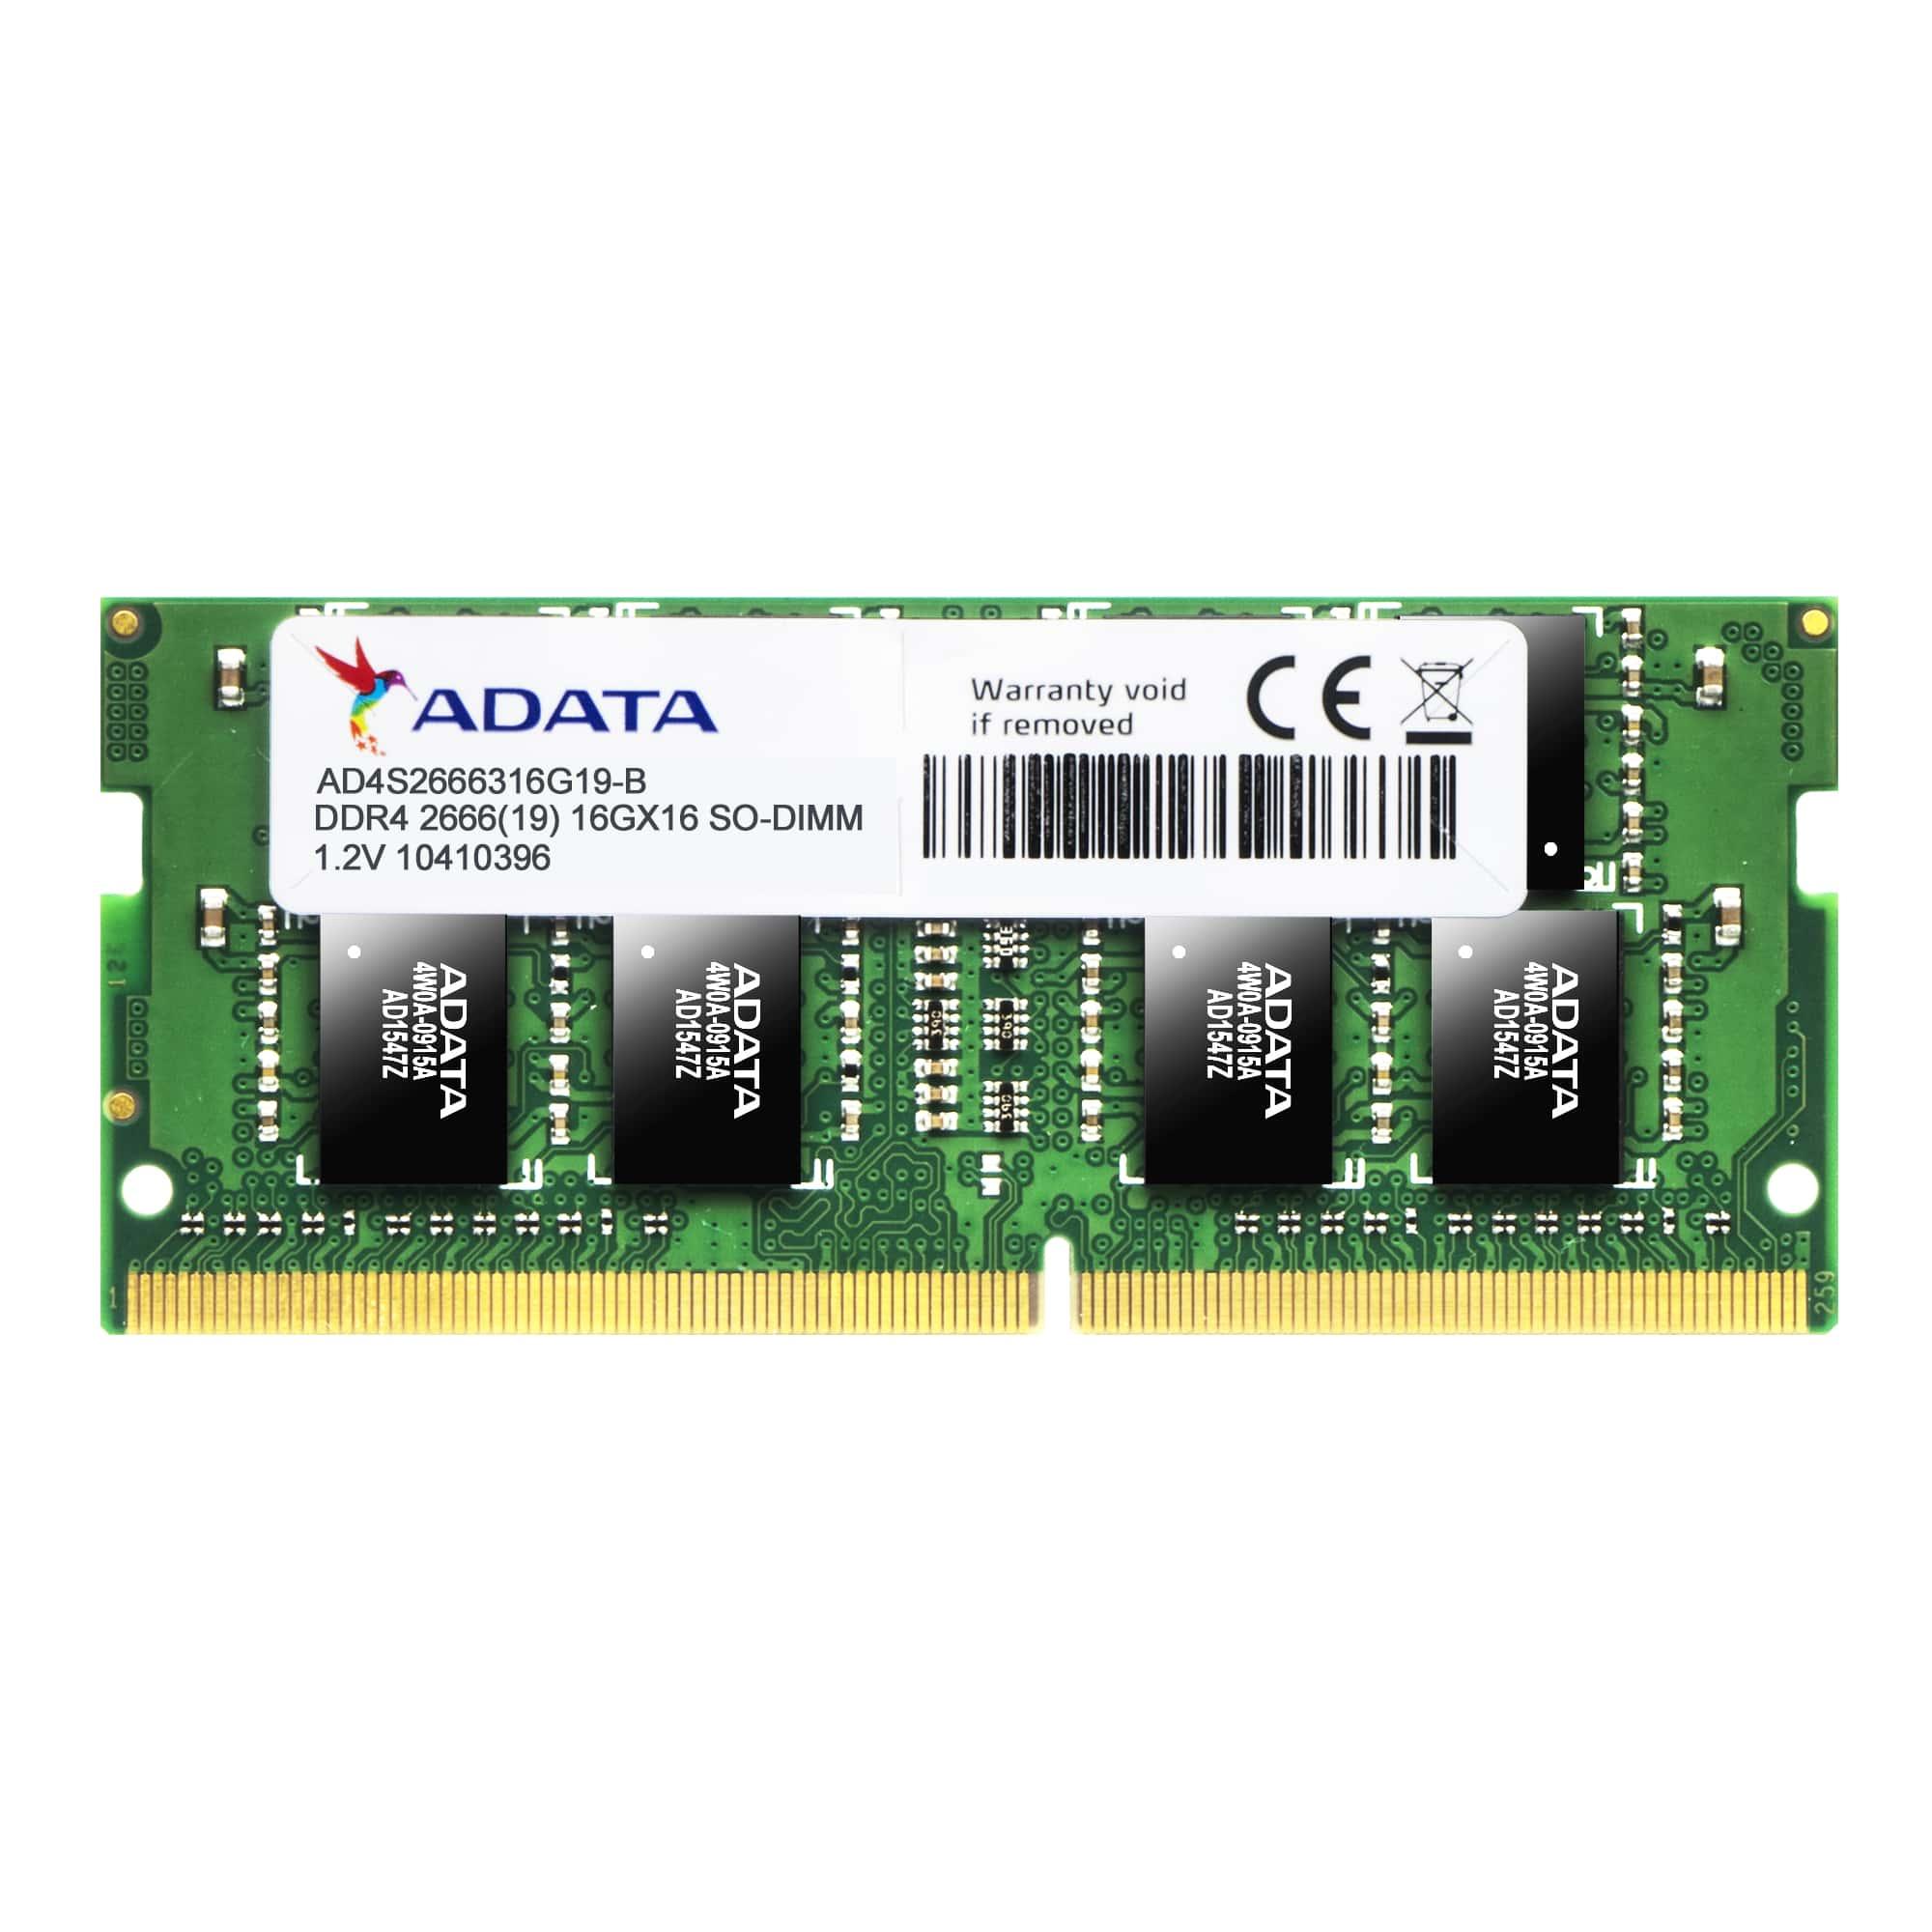 Adata Premier Series - Ddr4 - 8 GB - So-DIMM 260-pin - 2666 MHz / Pc4-21300 - Cl19 - 1.2 V - Unbuffe